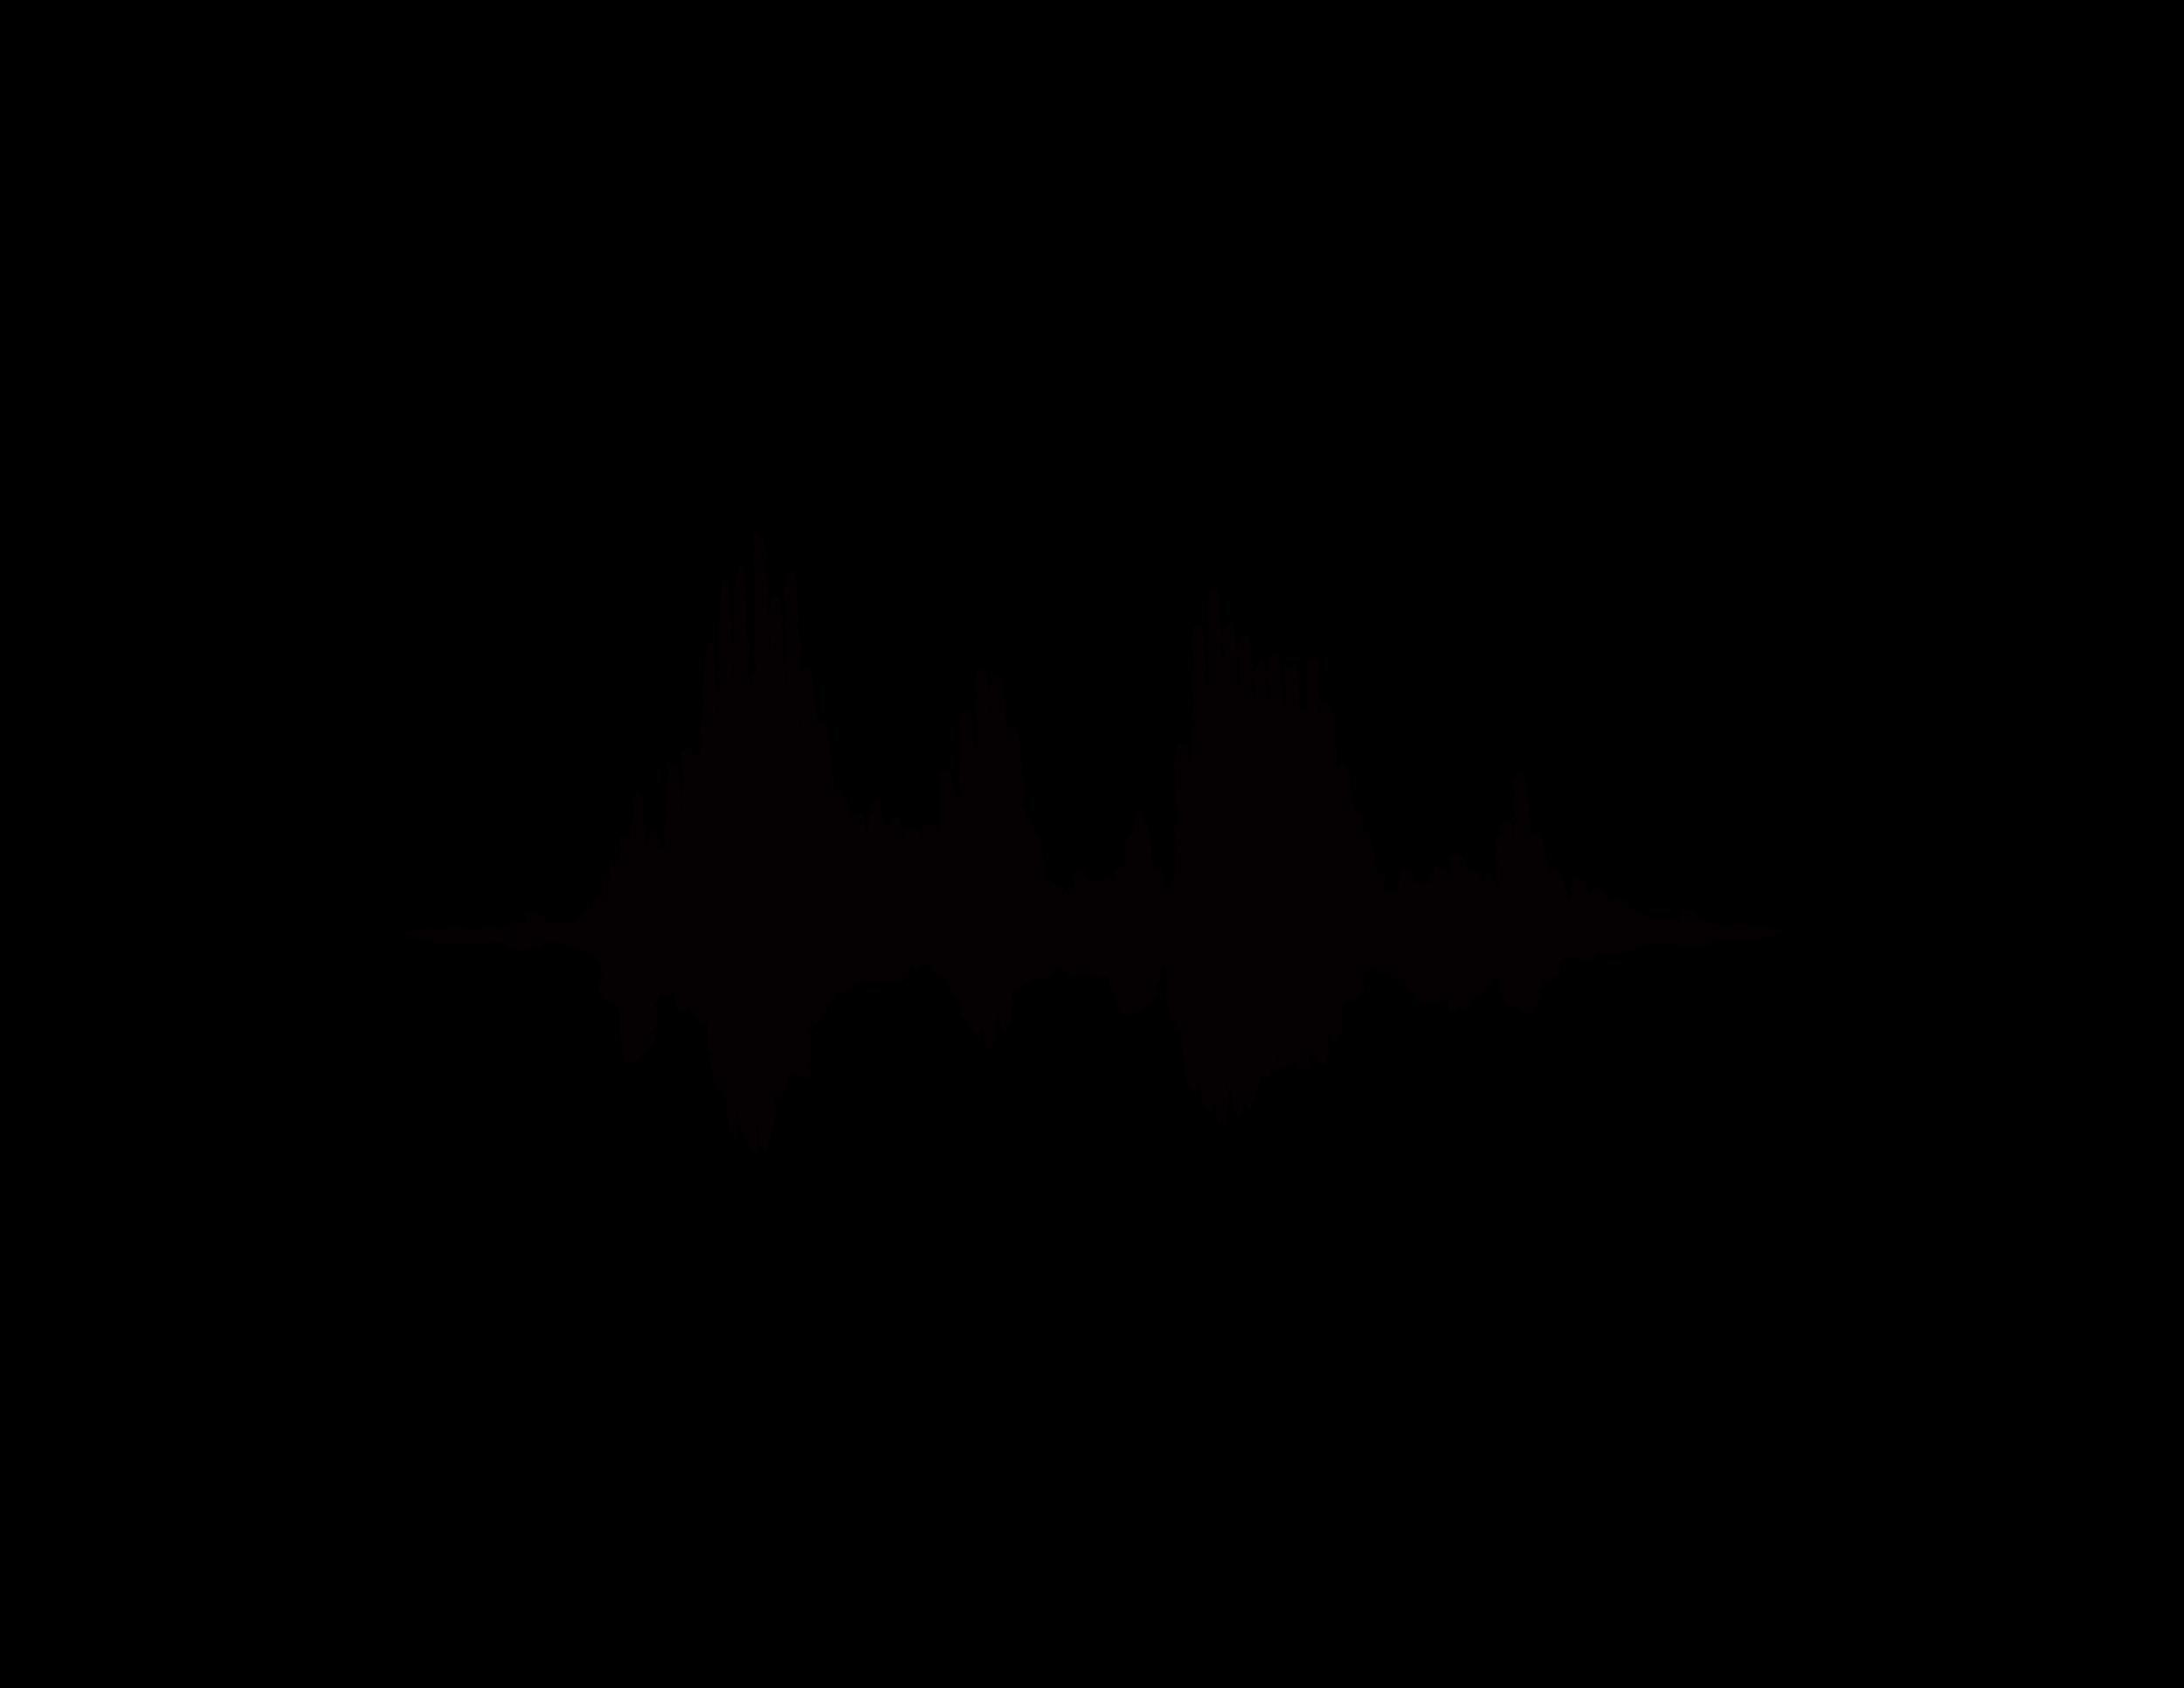 Conversation-Branding-Logomark-Primary-Black.png